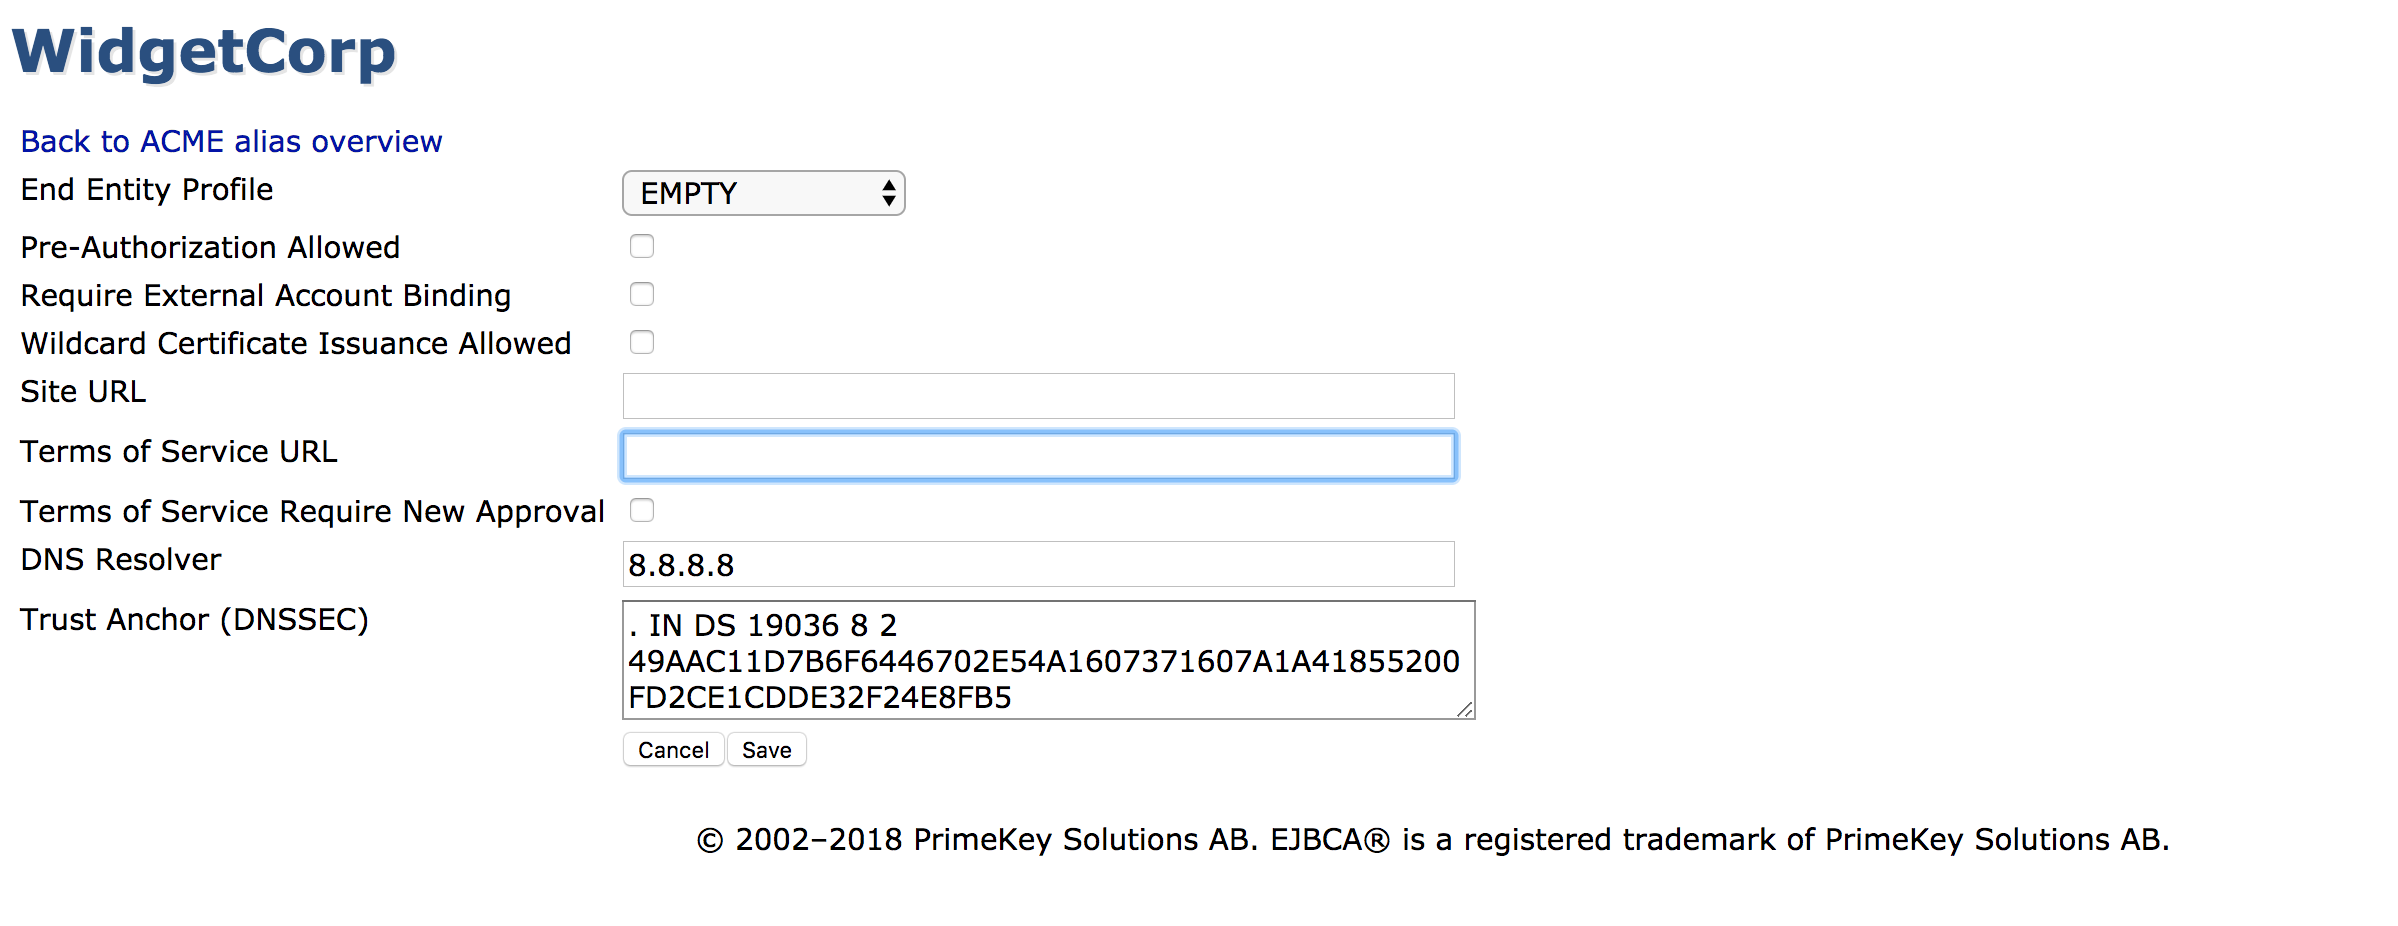 ACME - EJBCA - Documentation Space